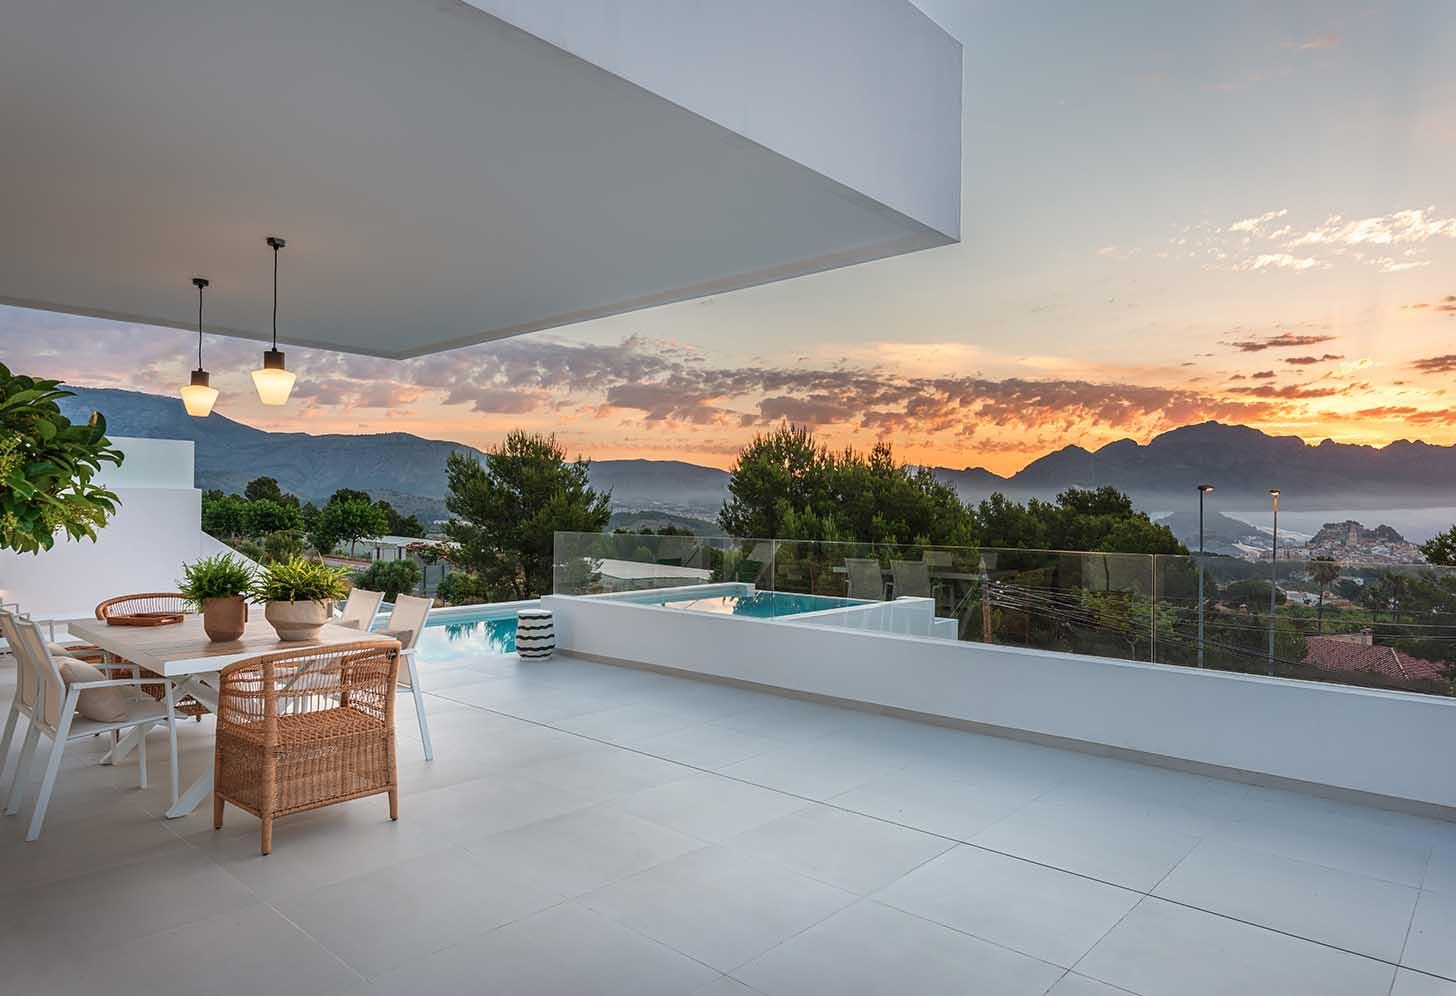 immobilier neuf espagne costa blanca alicante polop terrase piscine